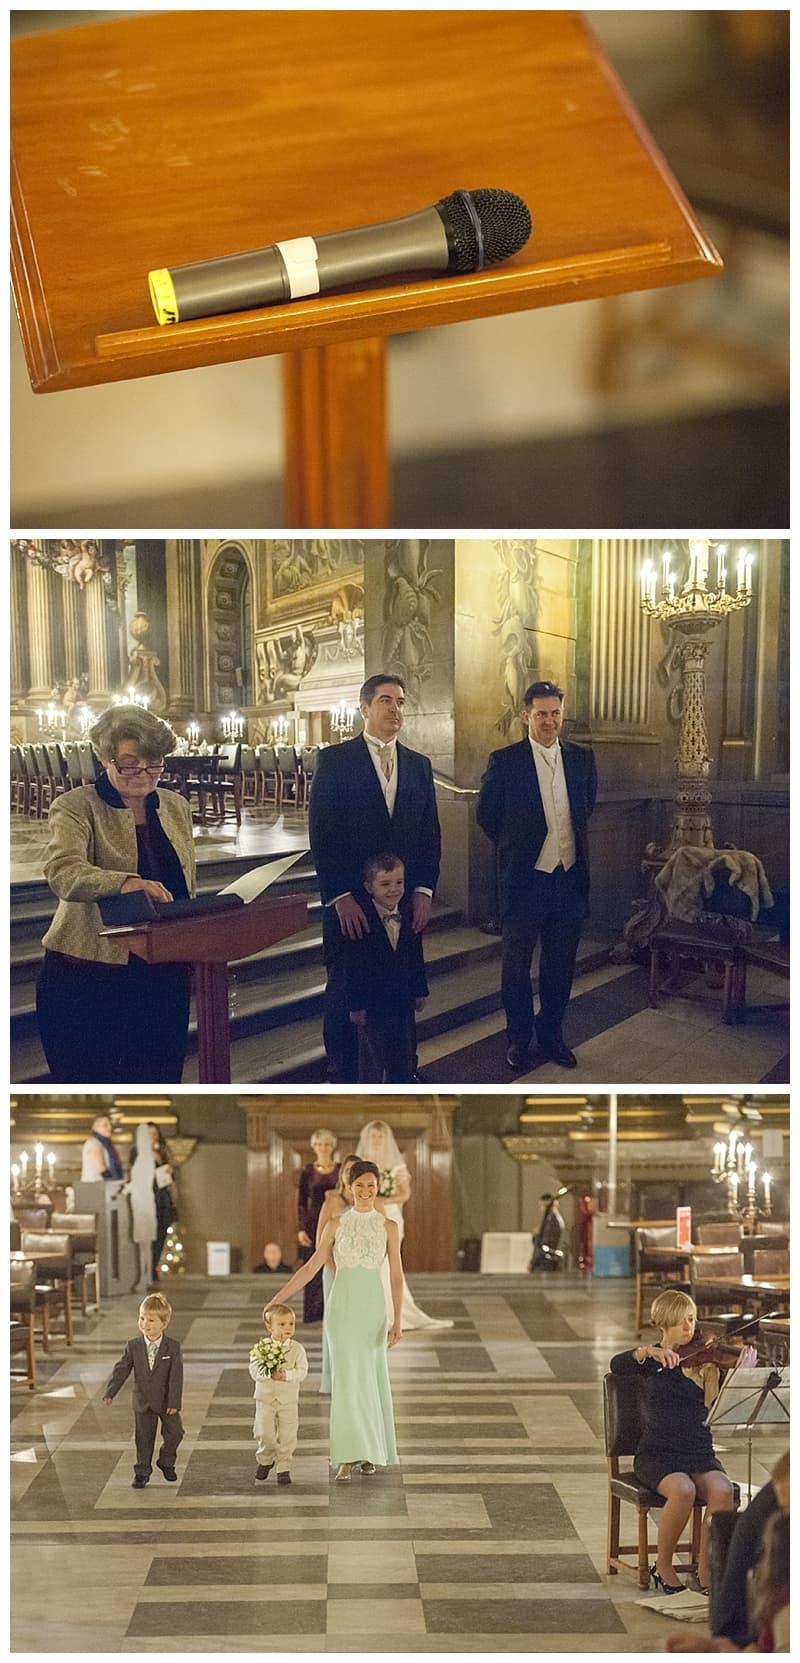 Royal Naval College Greenwich Wedding, Steve & Lisa, London Winter Wedding - Benjamin Wetherall Photography ©0013